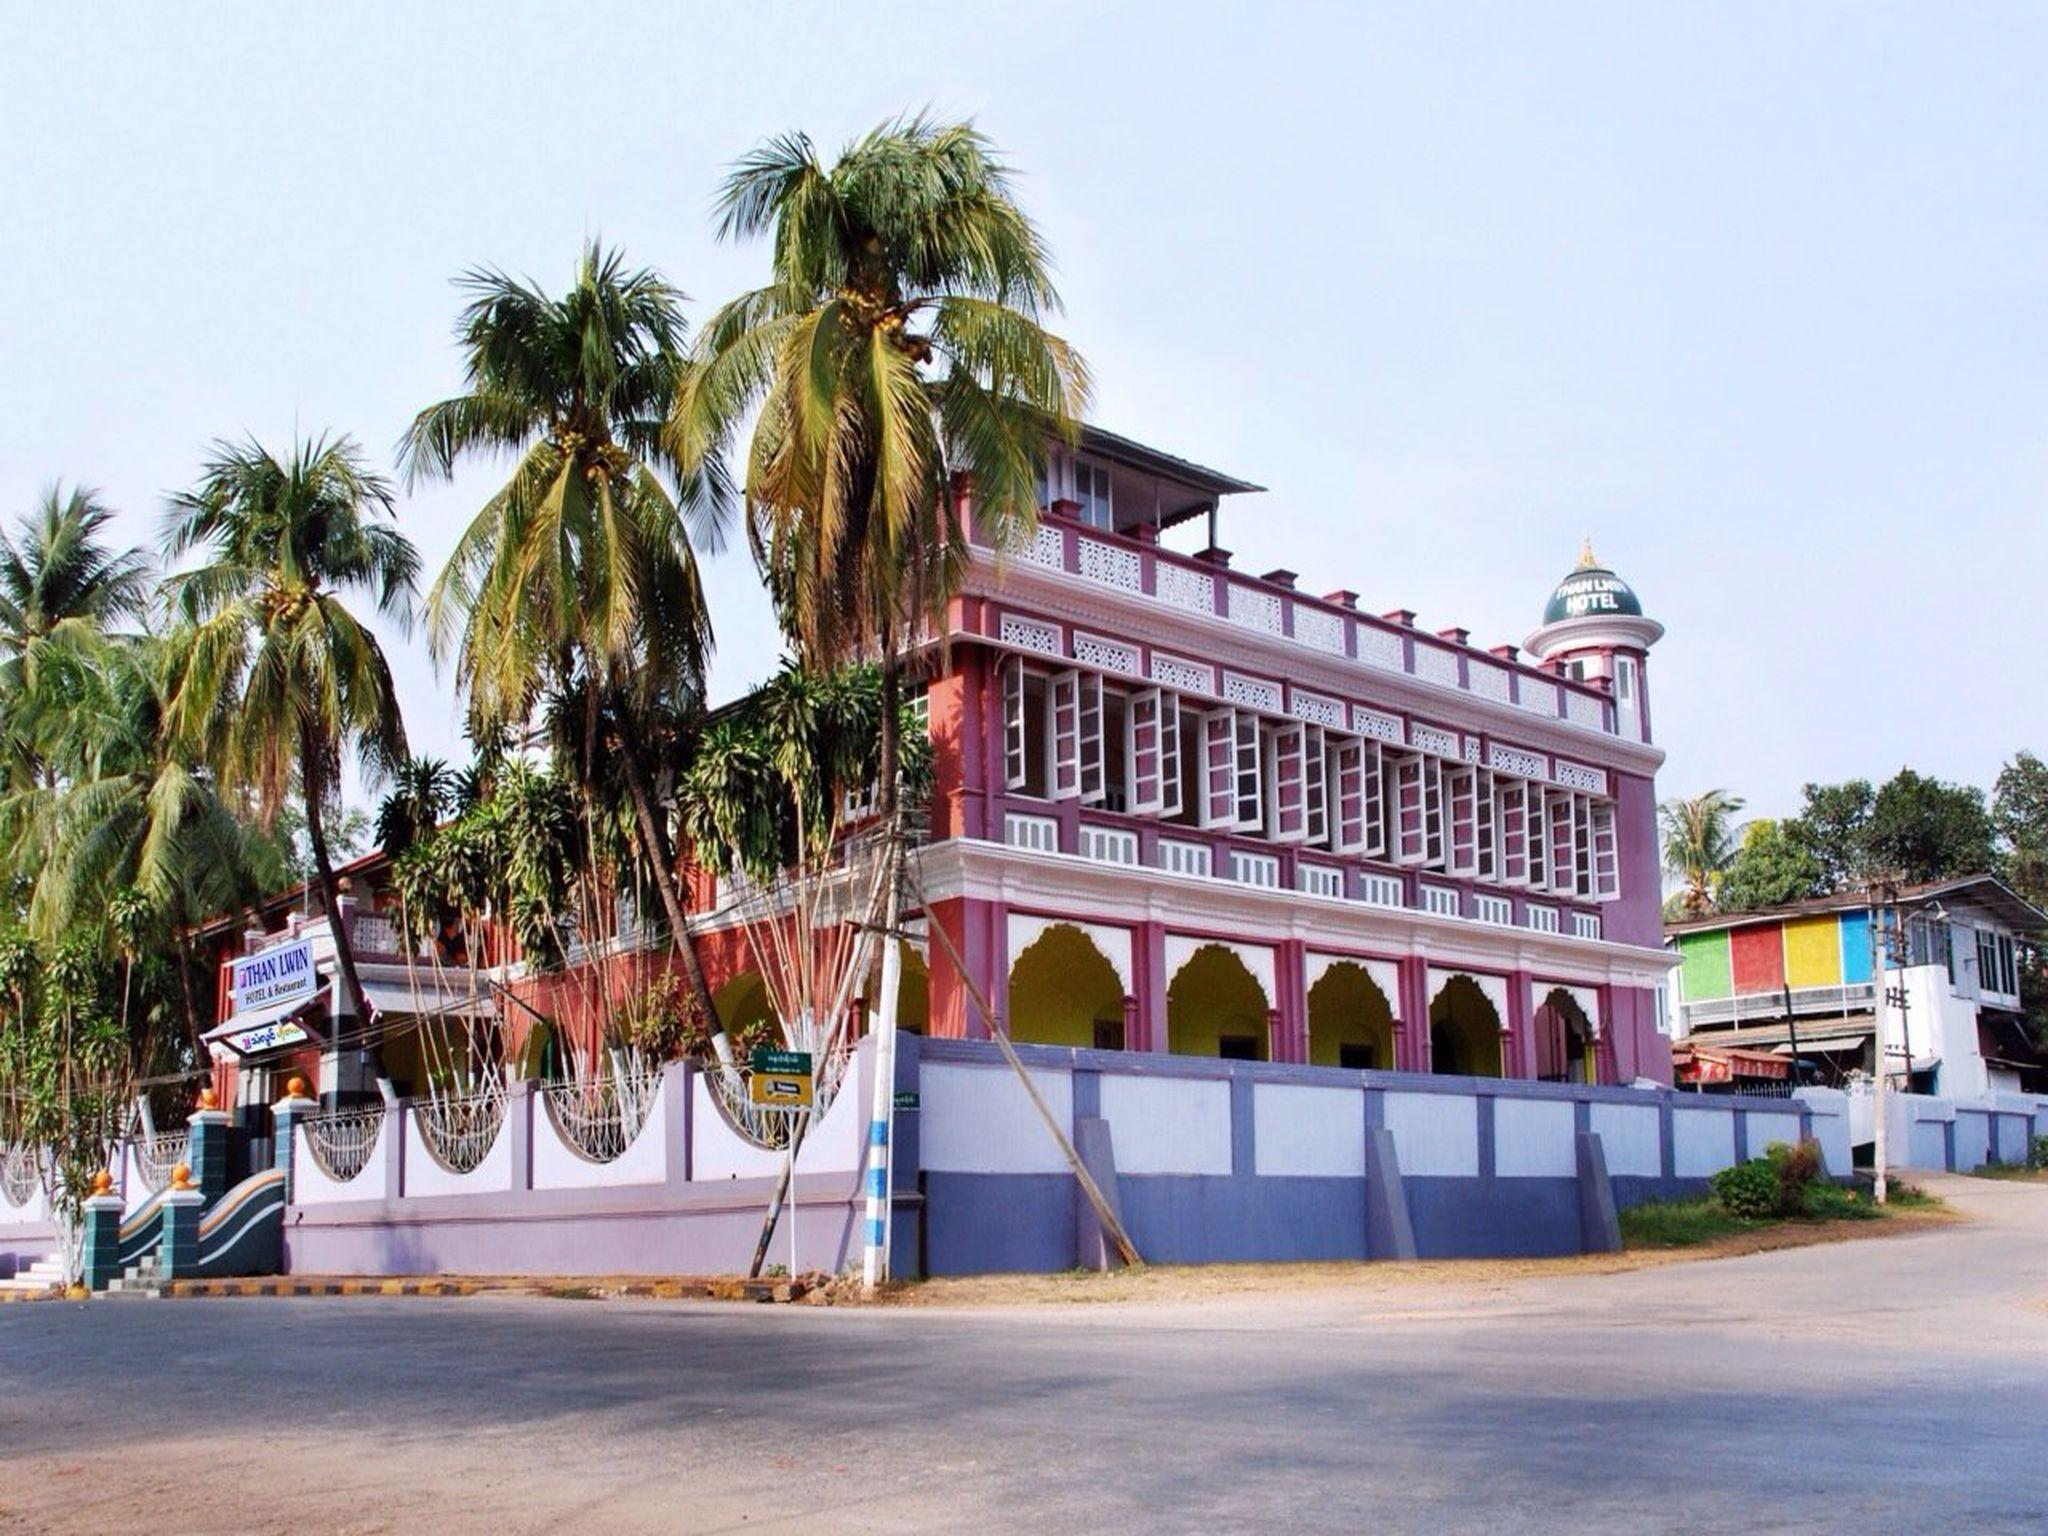 Than Lwin Hotel and Restaurant, Mawlamyine